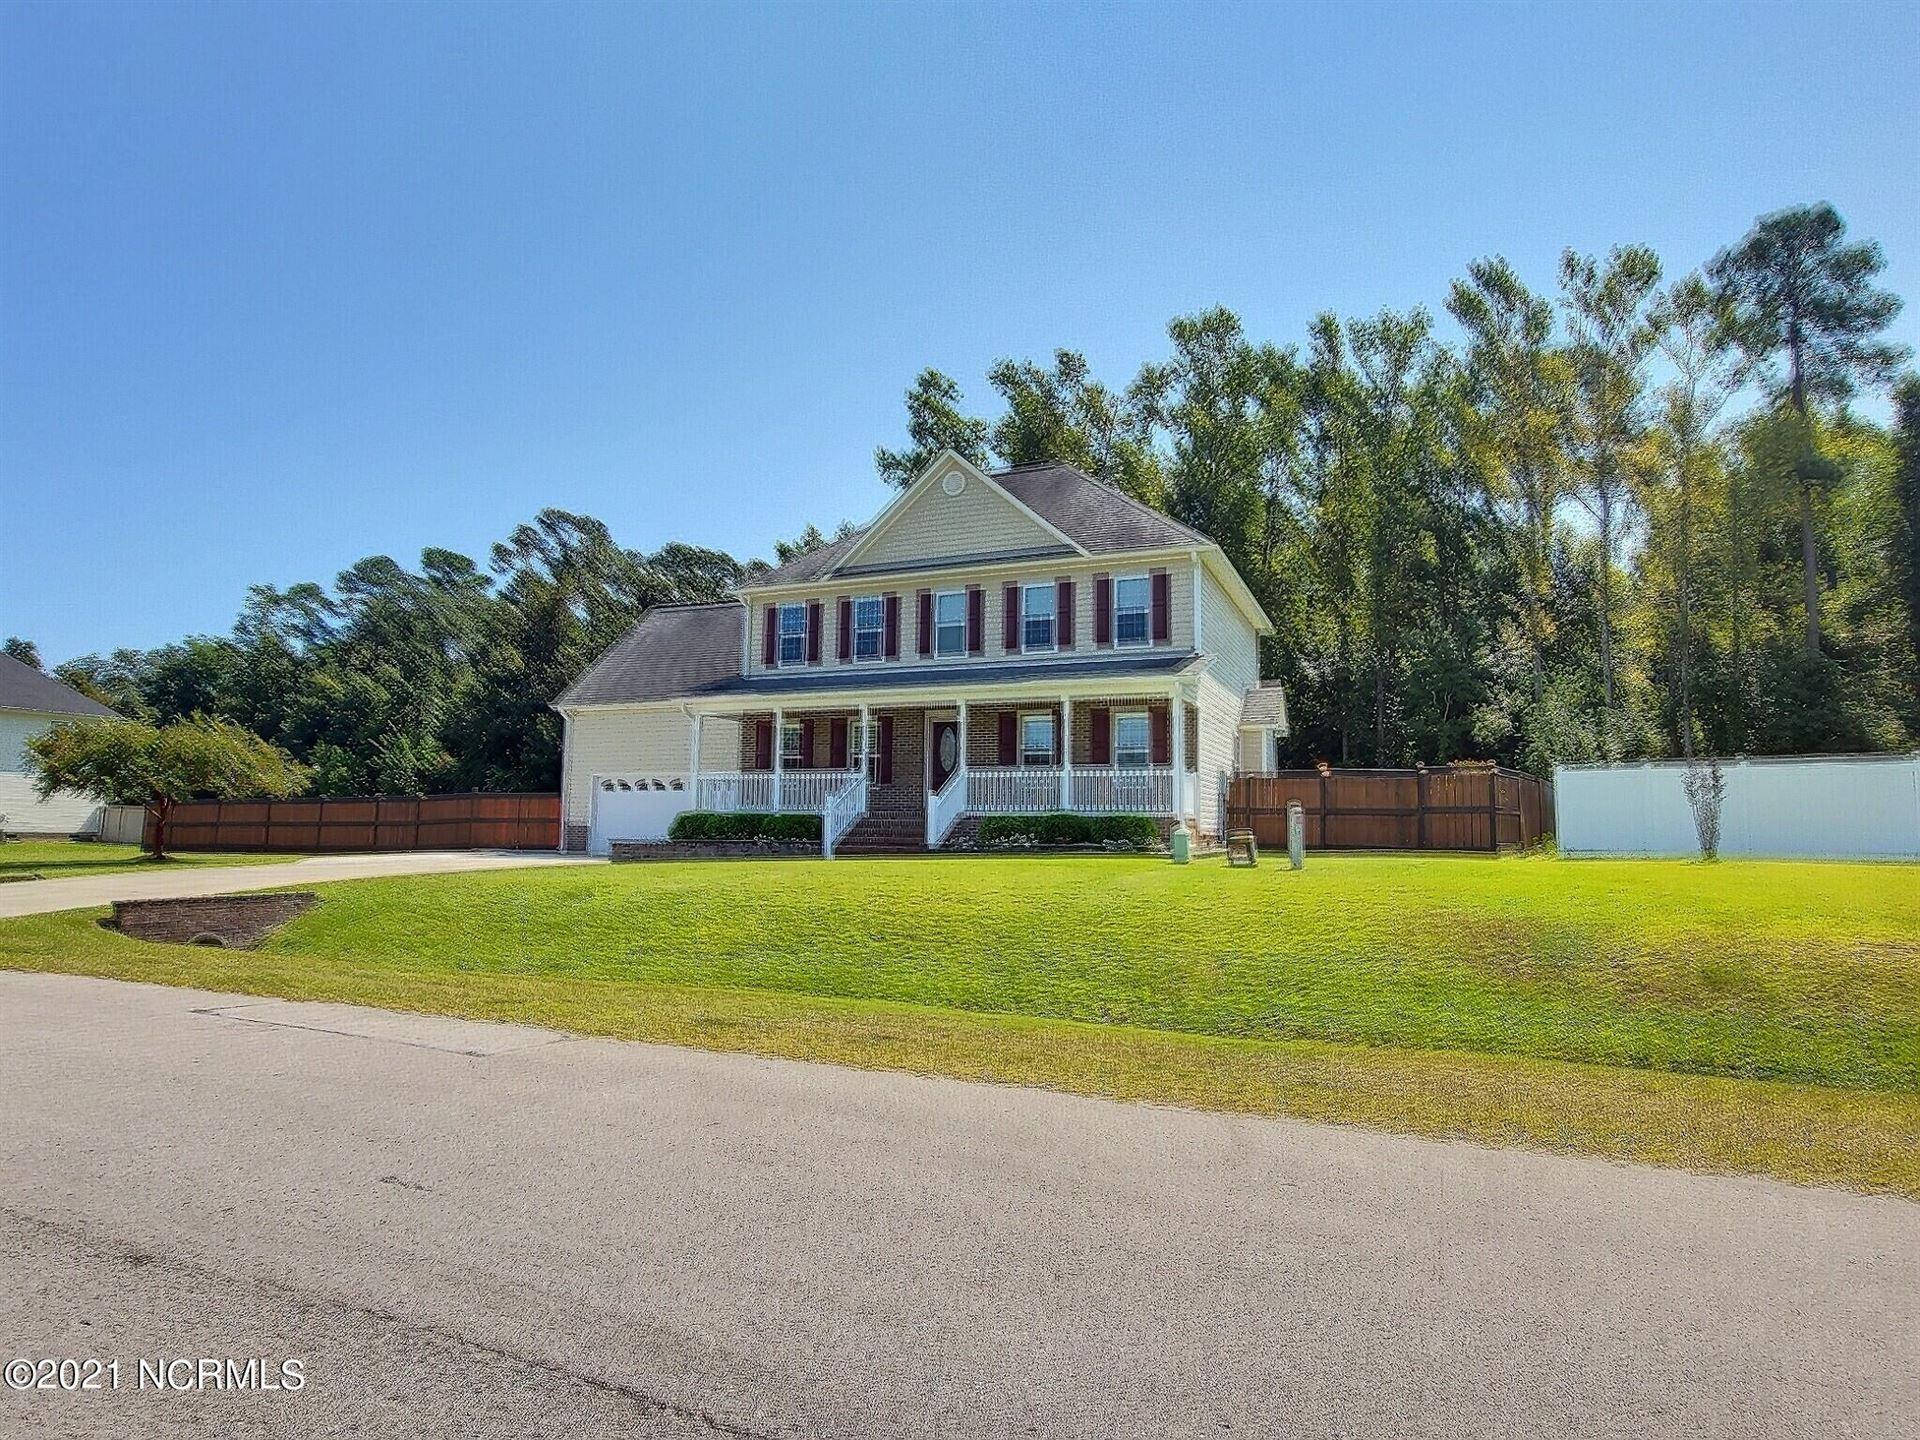 Photo of 140 Farmington Drive, Richlands, NC 28574 (MLS # 100290303)